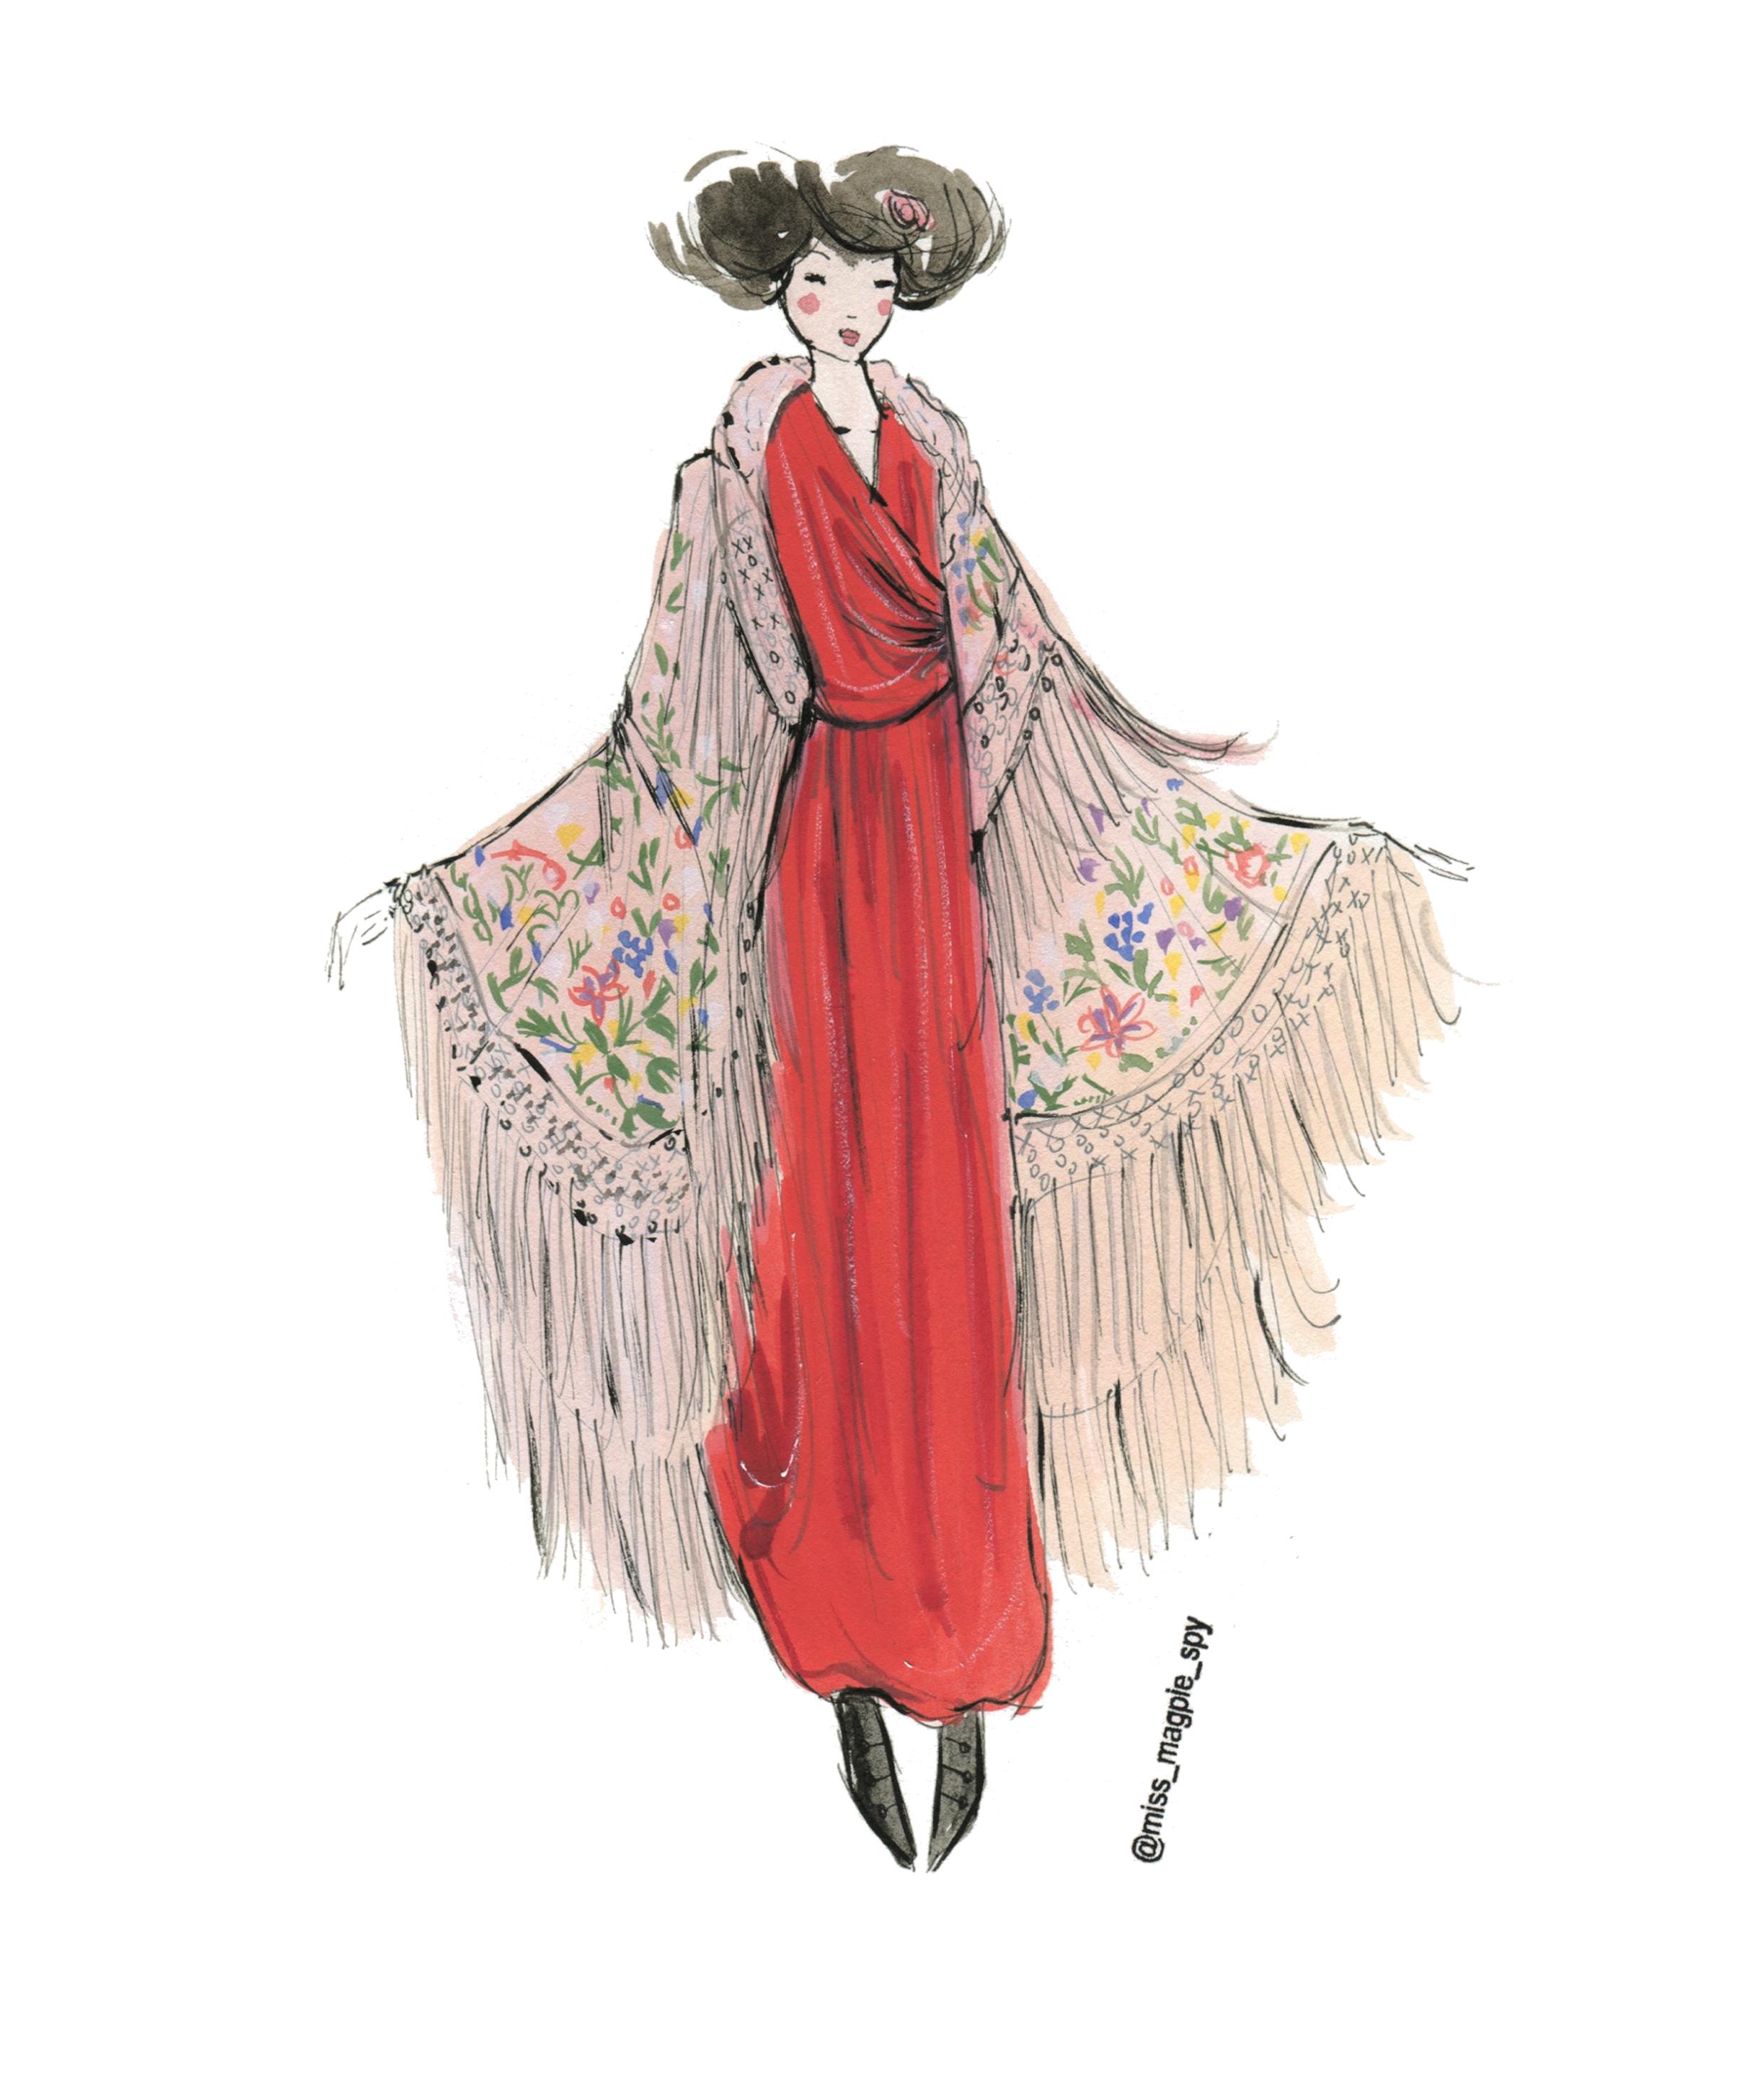 Illustration of a Poiret velvet dress with a embroidered tassled shawl